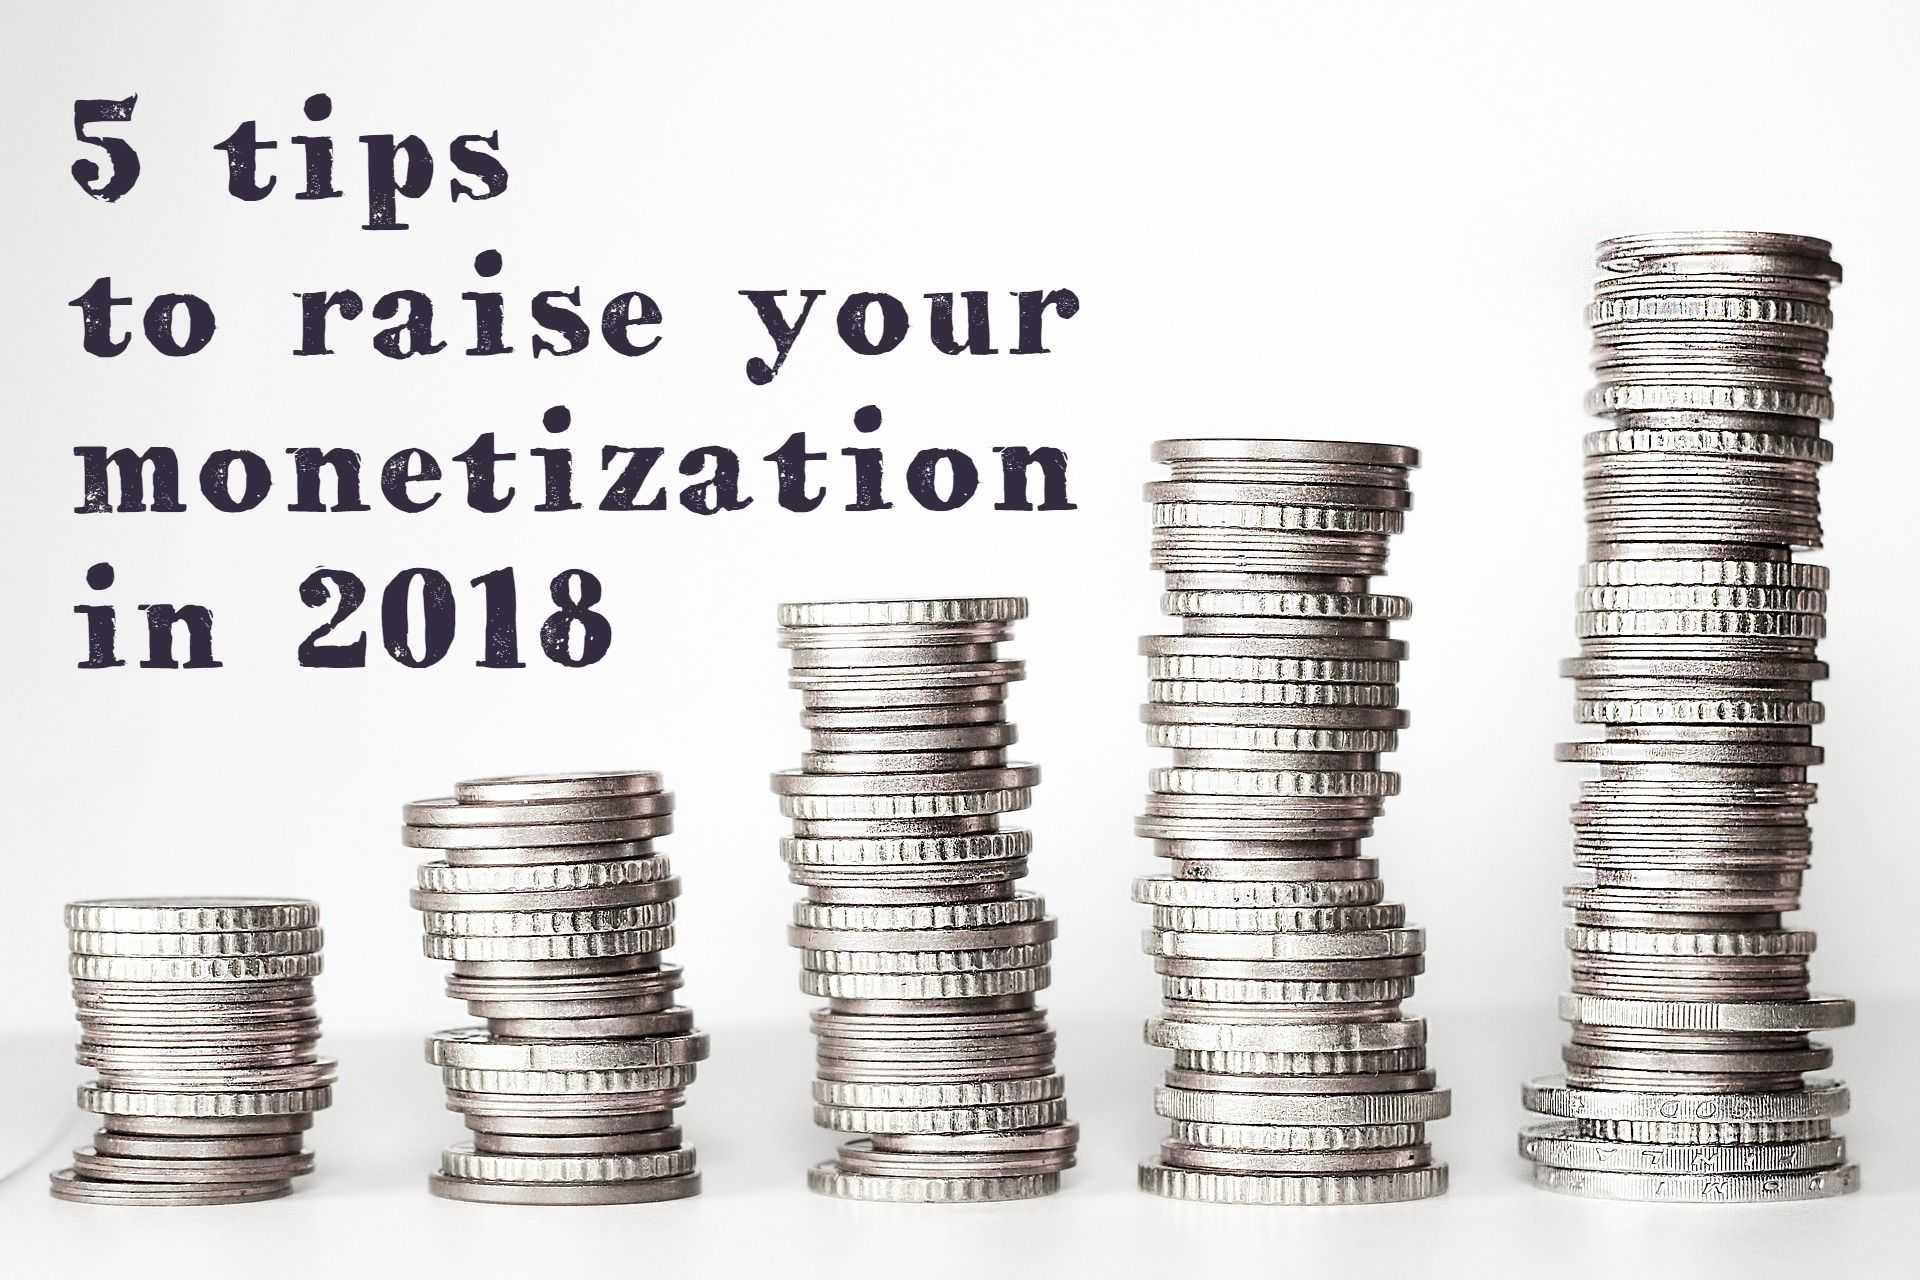 Tips to raise monetization - Admixer Blog